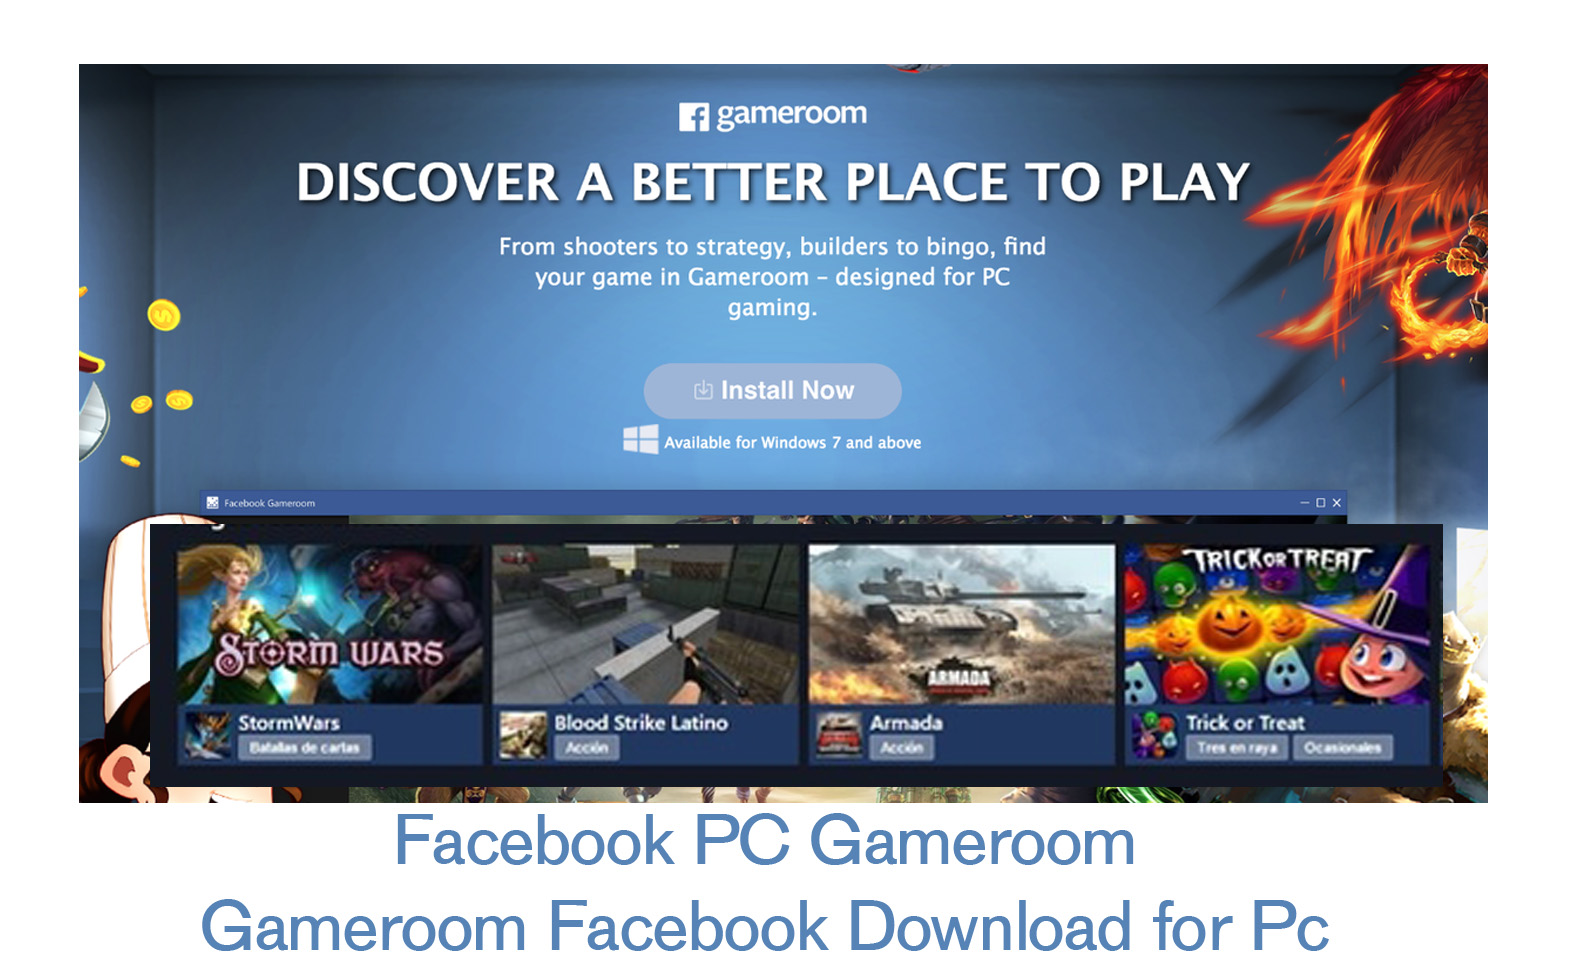 Facebook PC Gameroom - Gameroom Facebook Download for Pc